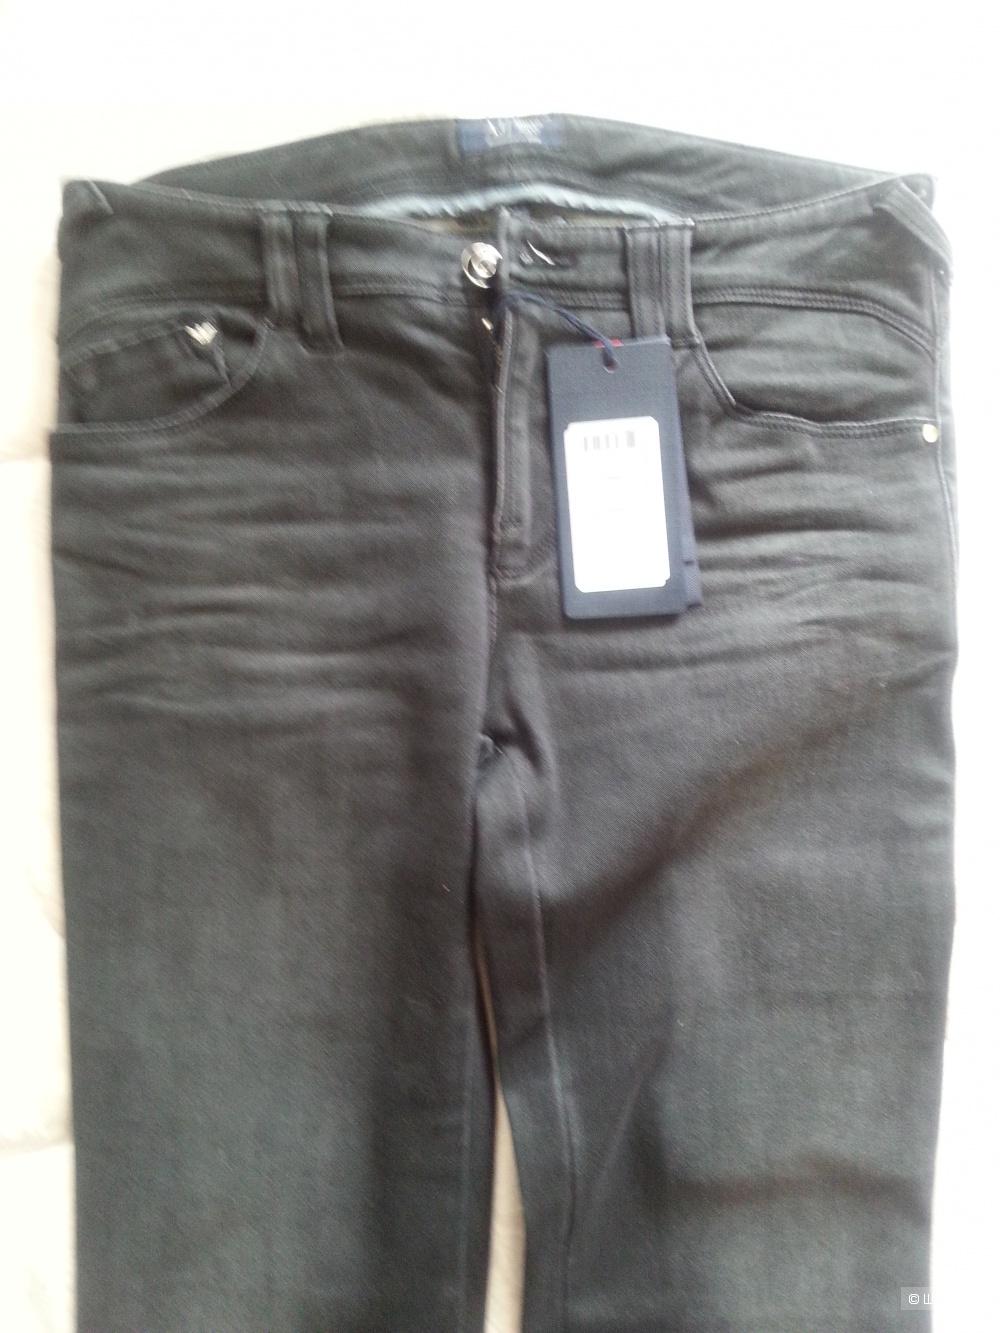 ed1742a62e37 Джинсы Armani jeans размер 27, в магазине YOOX — на Шопоголик